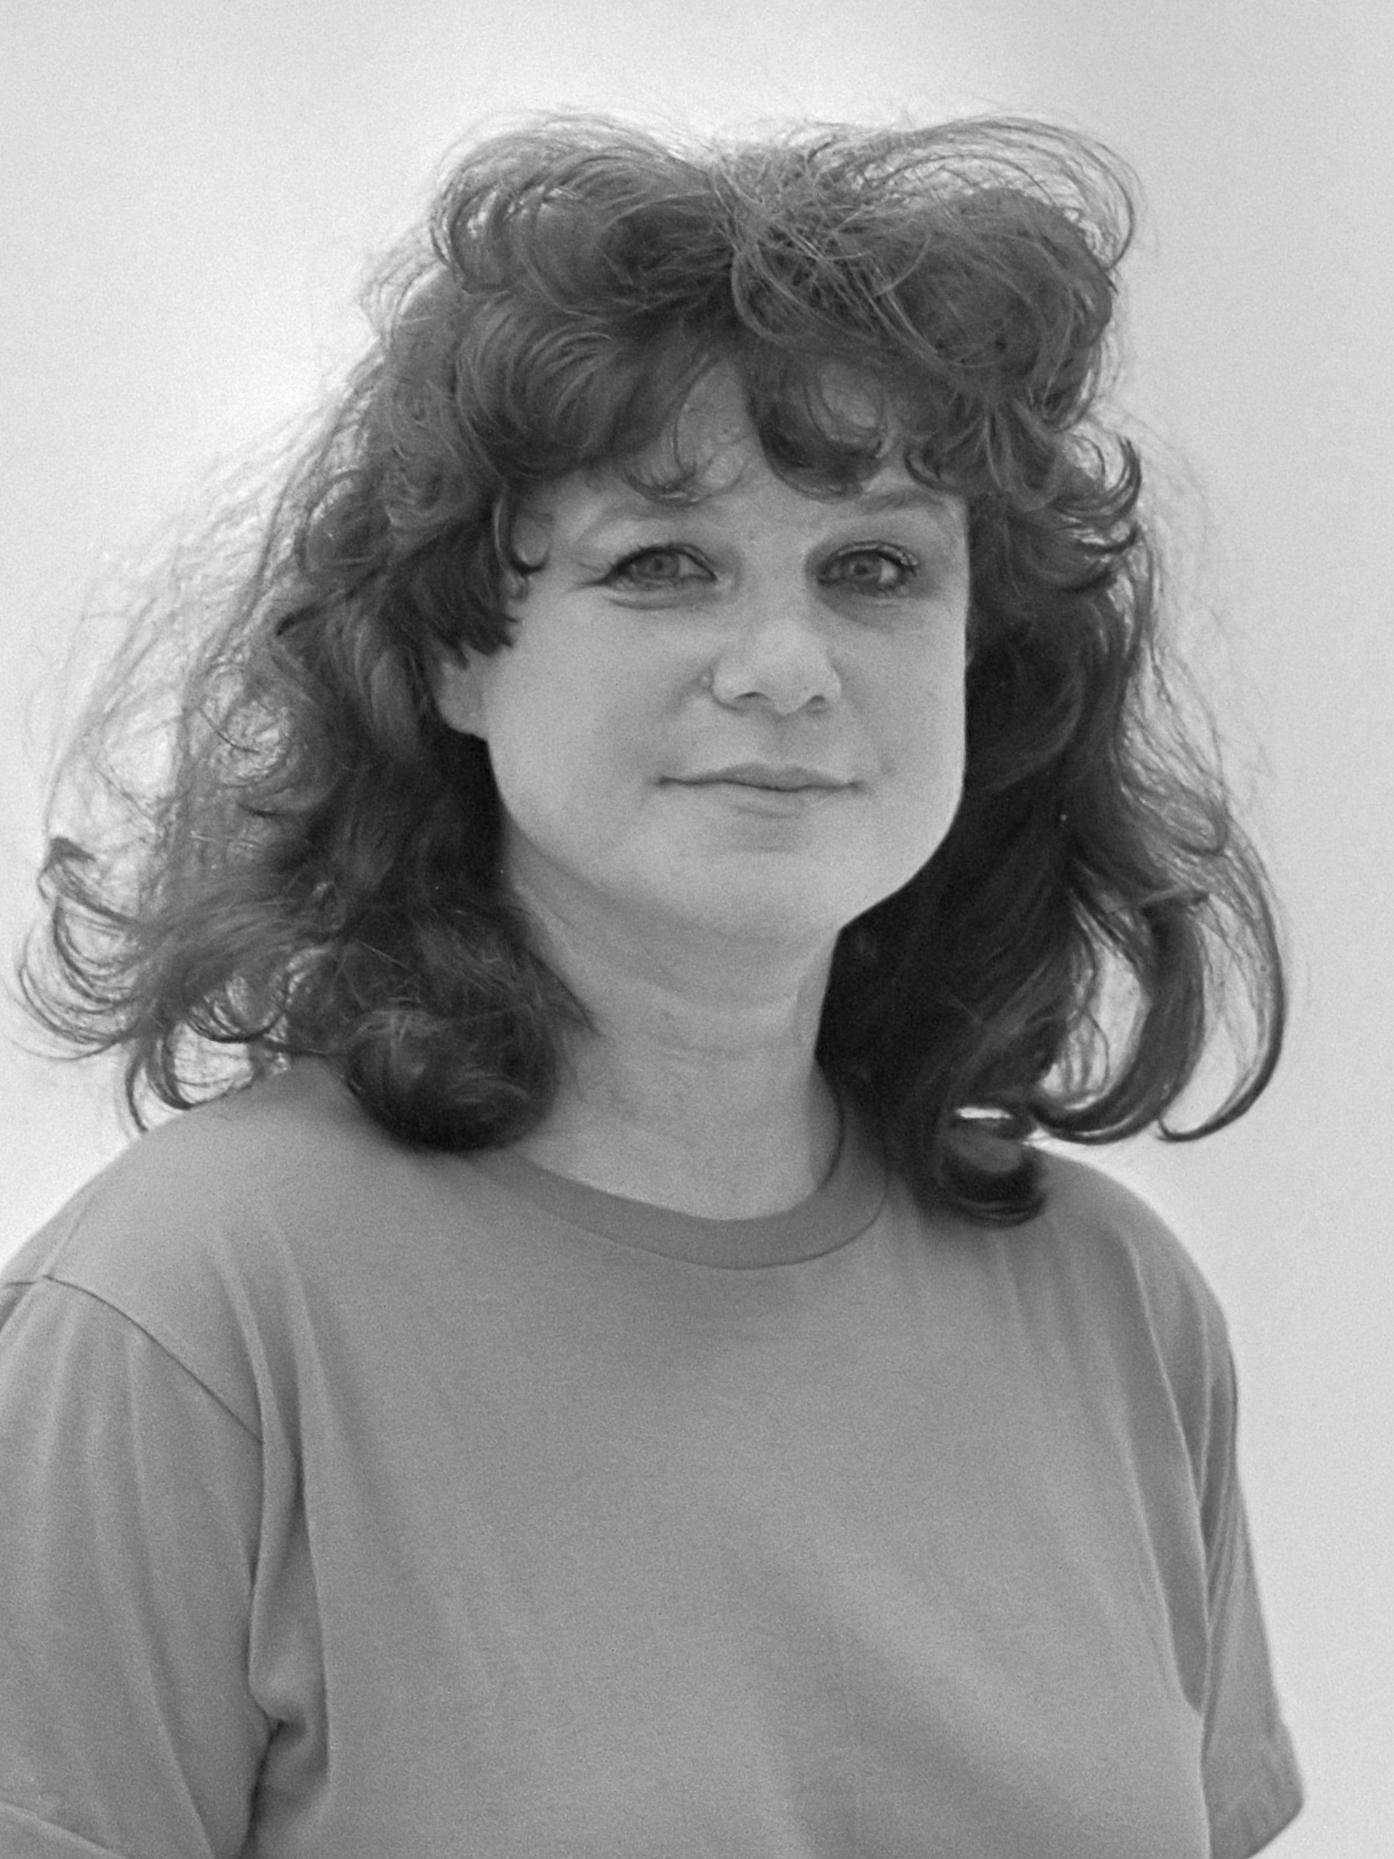 Jacqueline de Jong, 1982. Foto met dank aan Wikimedia Commons, Rob Bogaerts, CC BY-SA 3.0